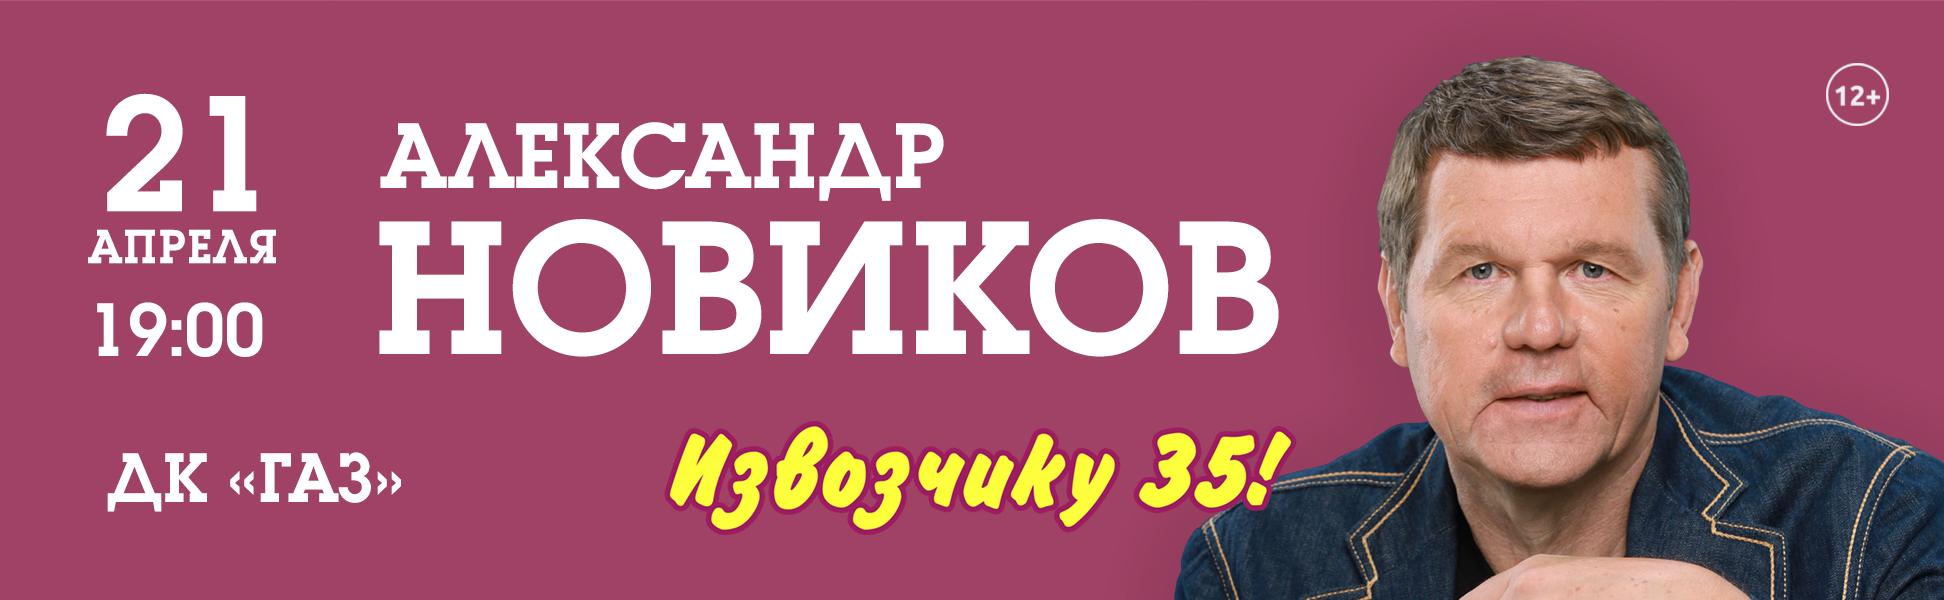 Александр Новиков с программой Извозчику 35!